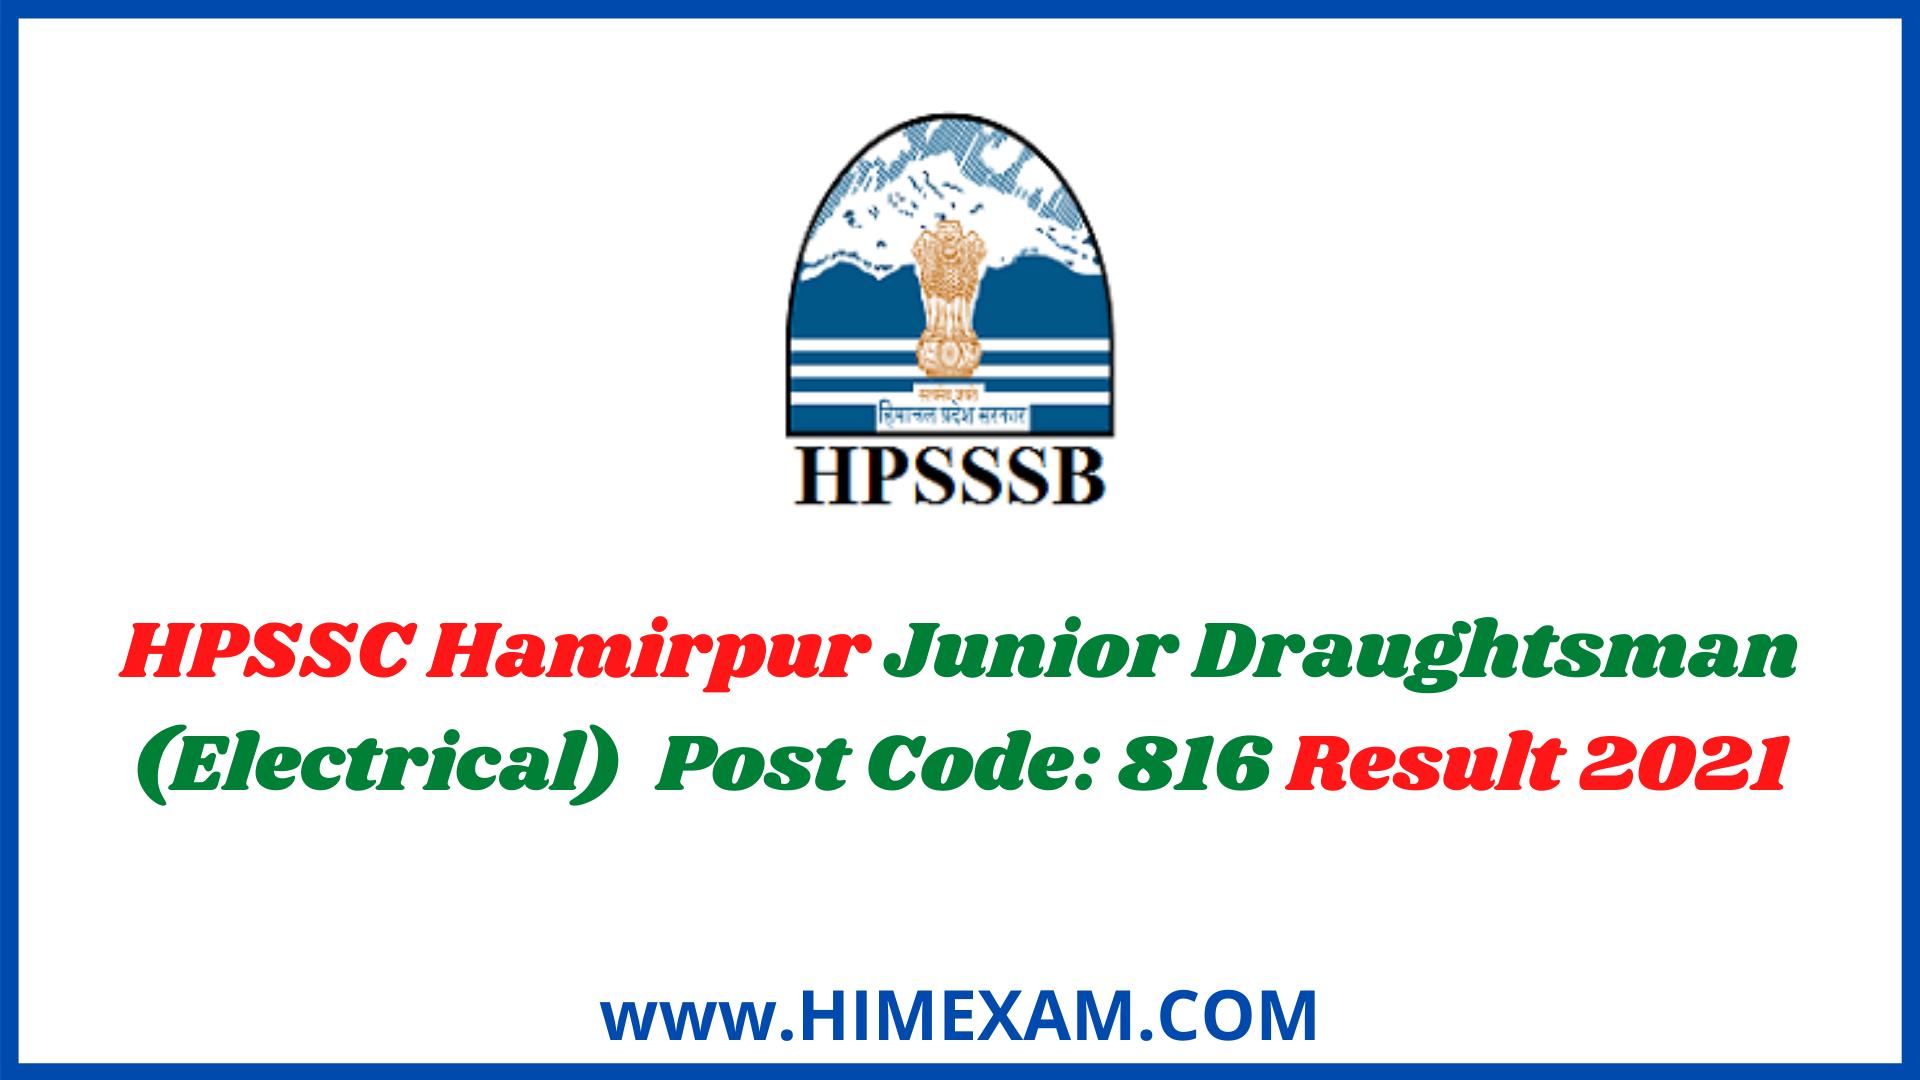 HPSSC Hamirpur Junior Draughtsman (Electrical)  Post Code: 816 Result 2021